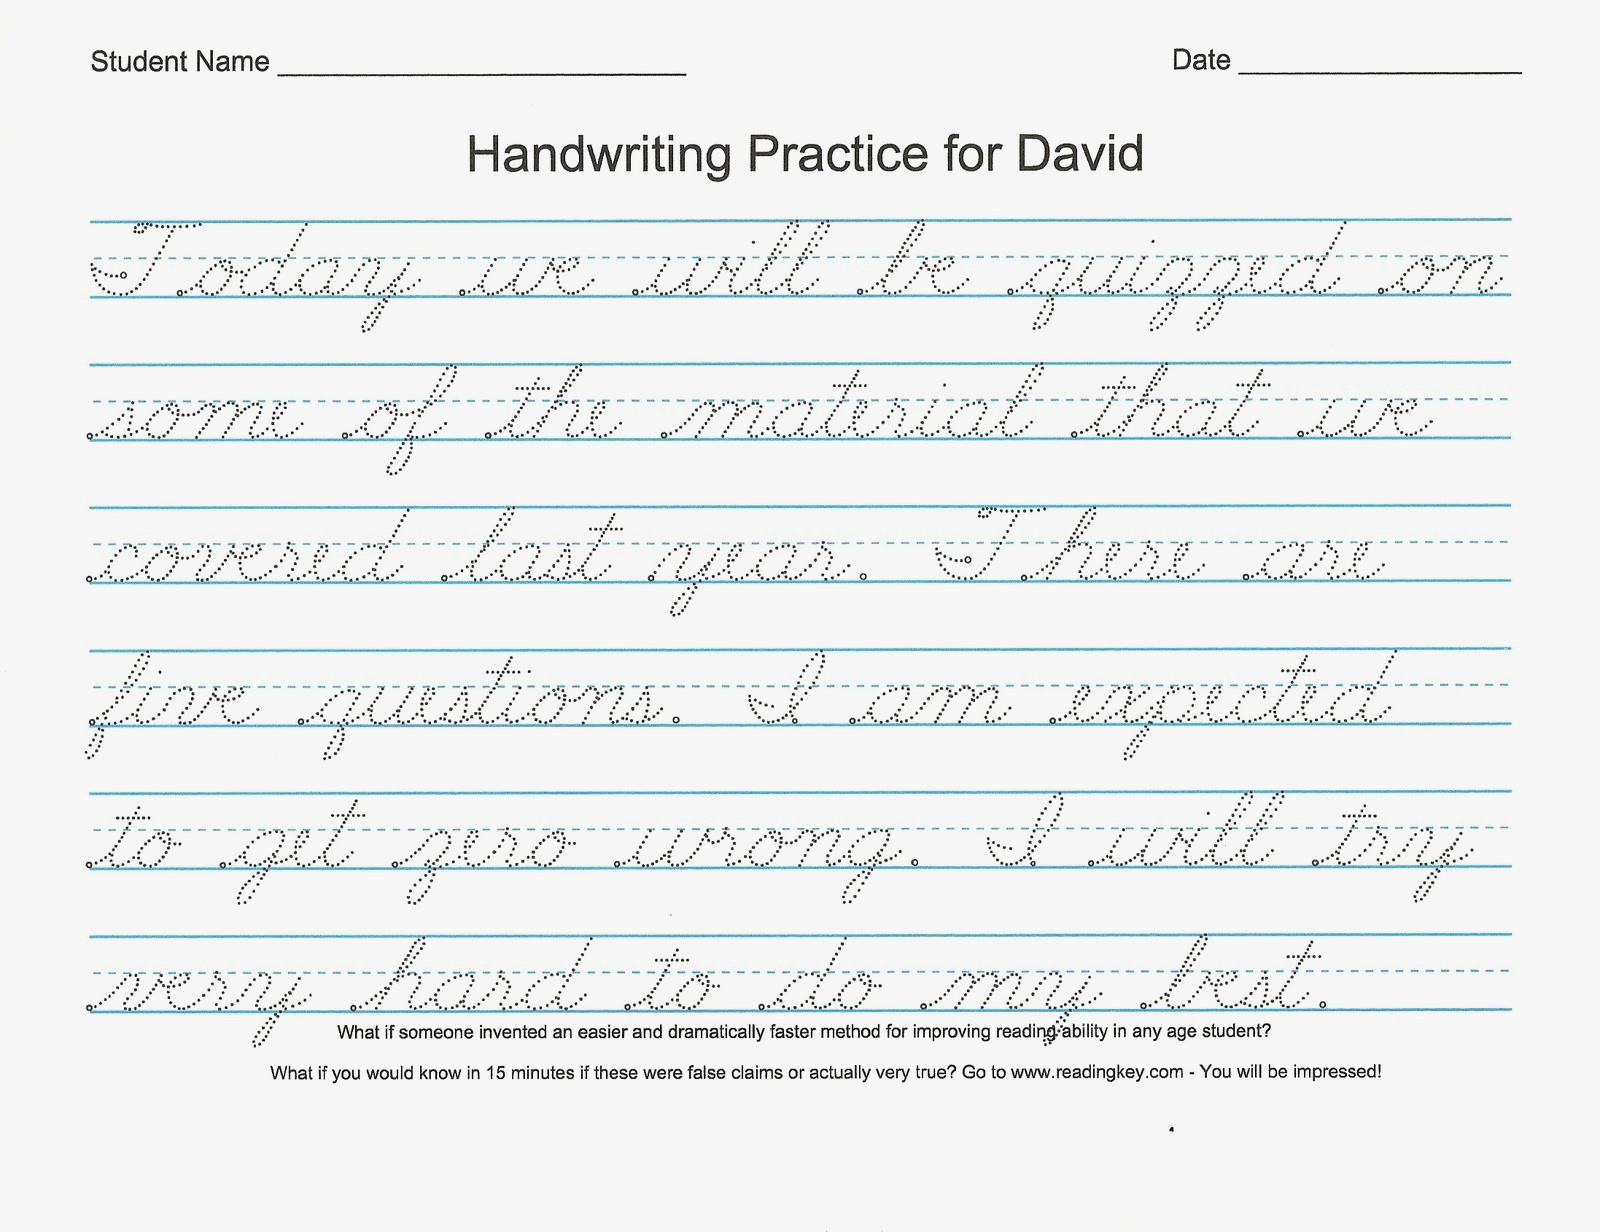 54 Unique Of Free Printable Cursive Handwriting Worksheets Pic   Free Printable Worksheets Handwriting Practice